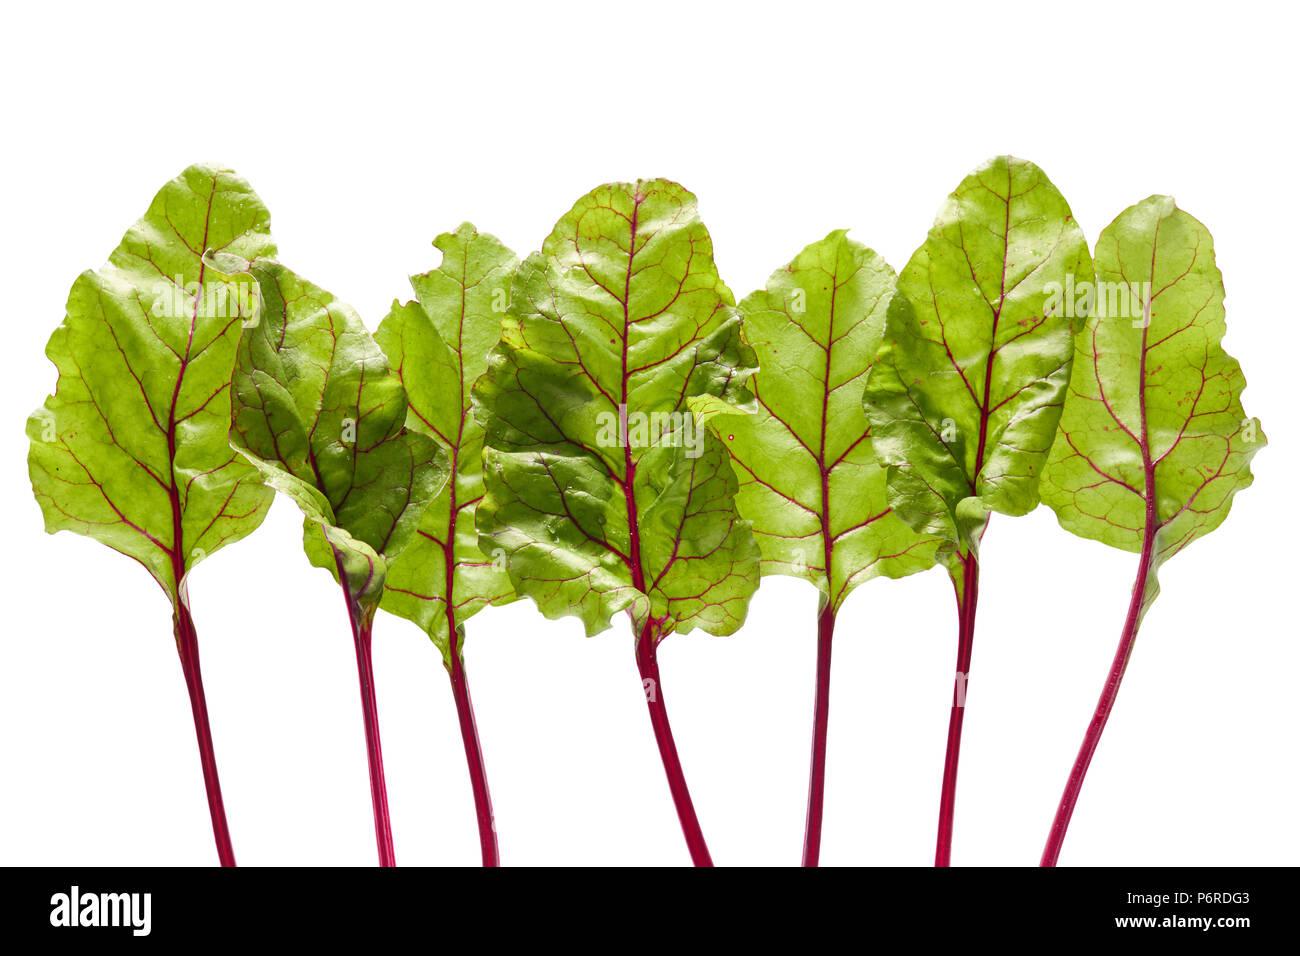 Fresh organic beetroot leaves, on white background - Stock Image